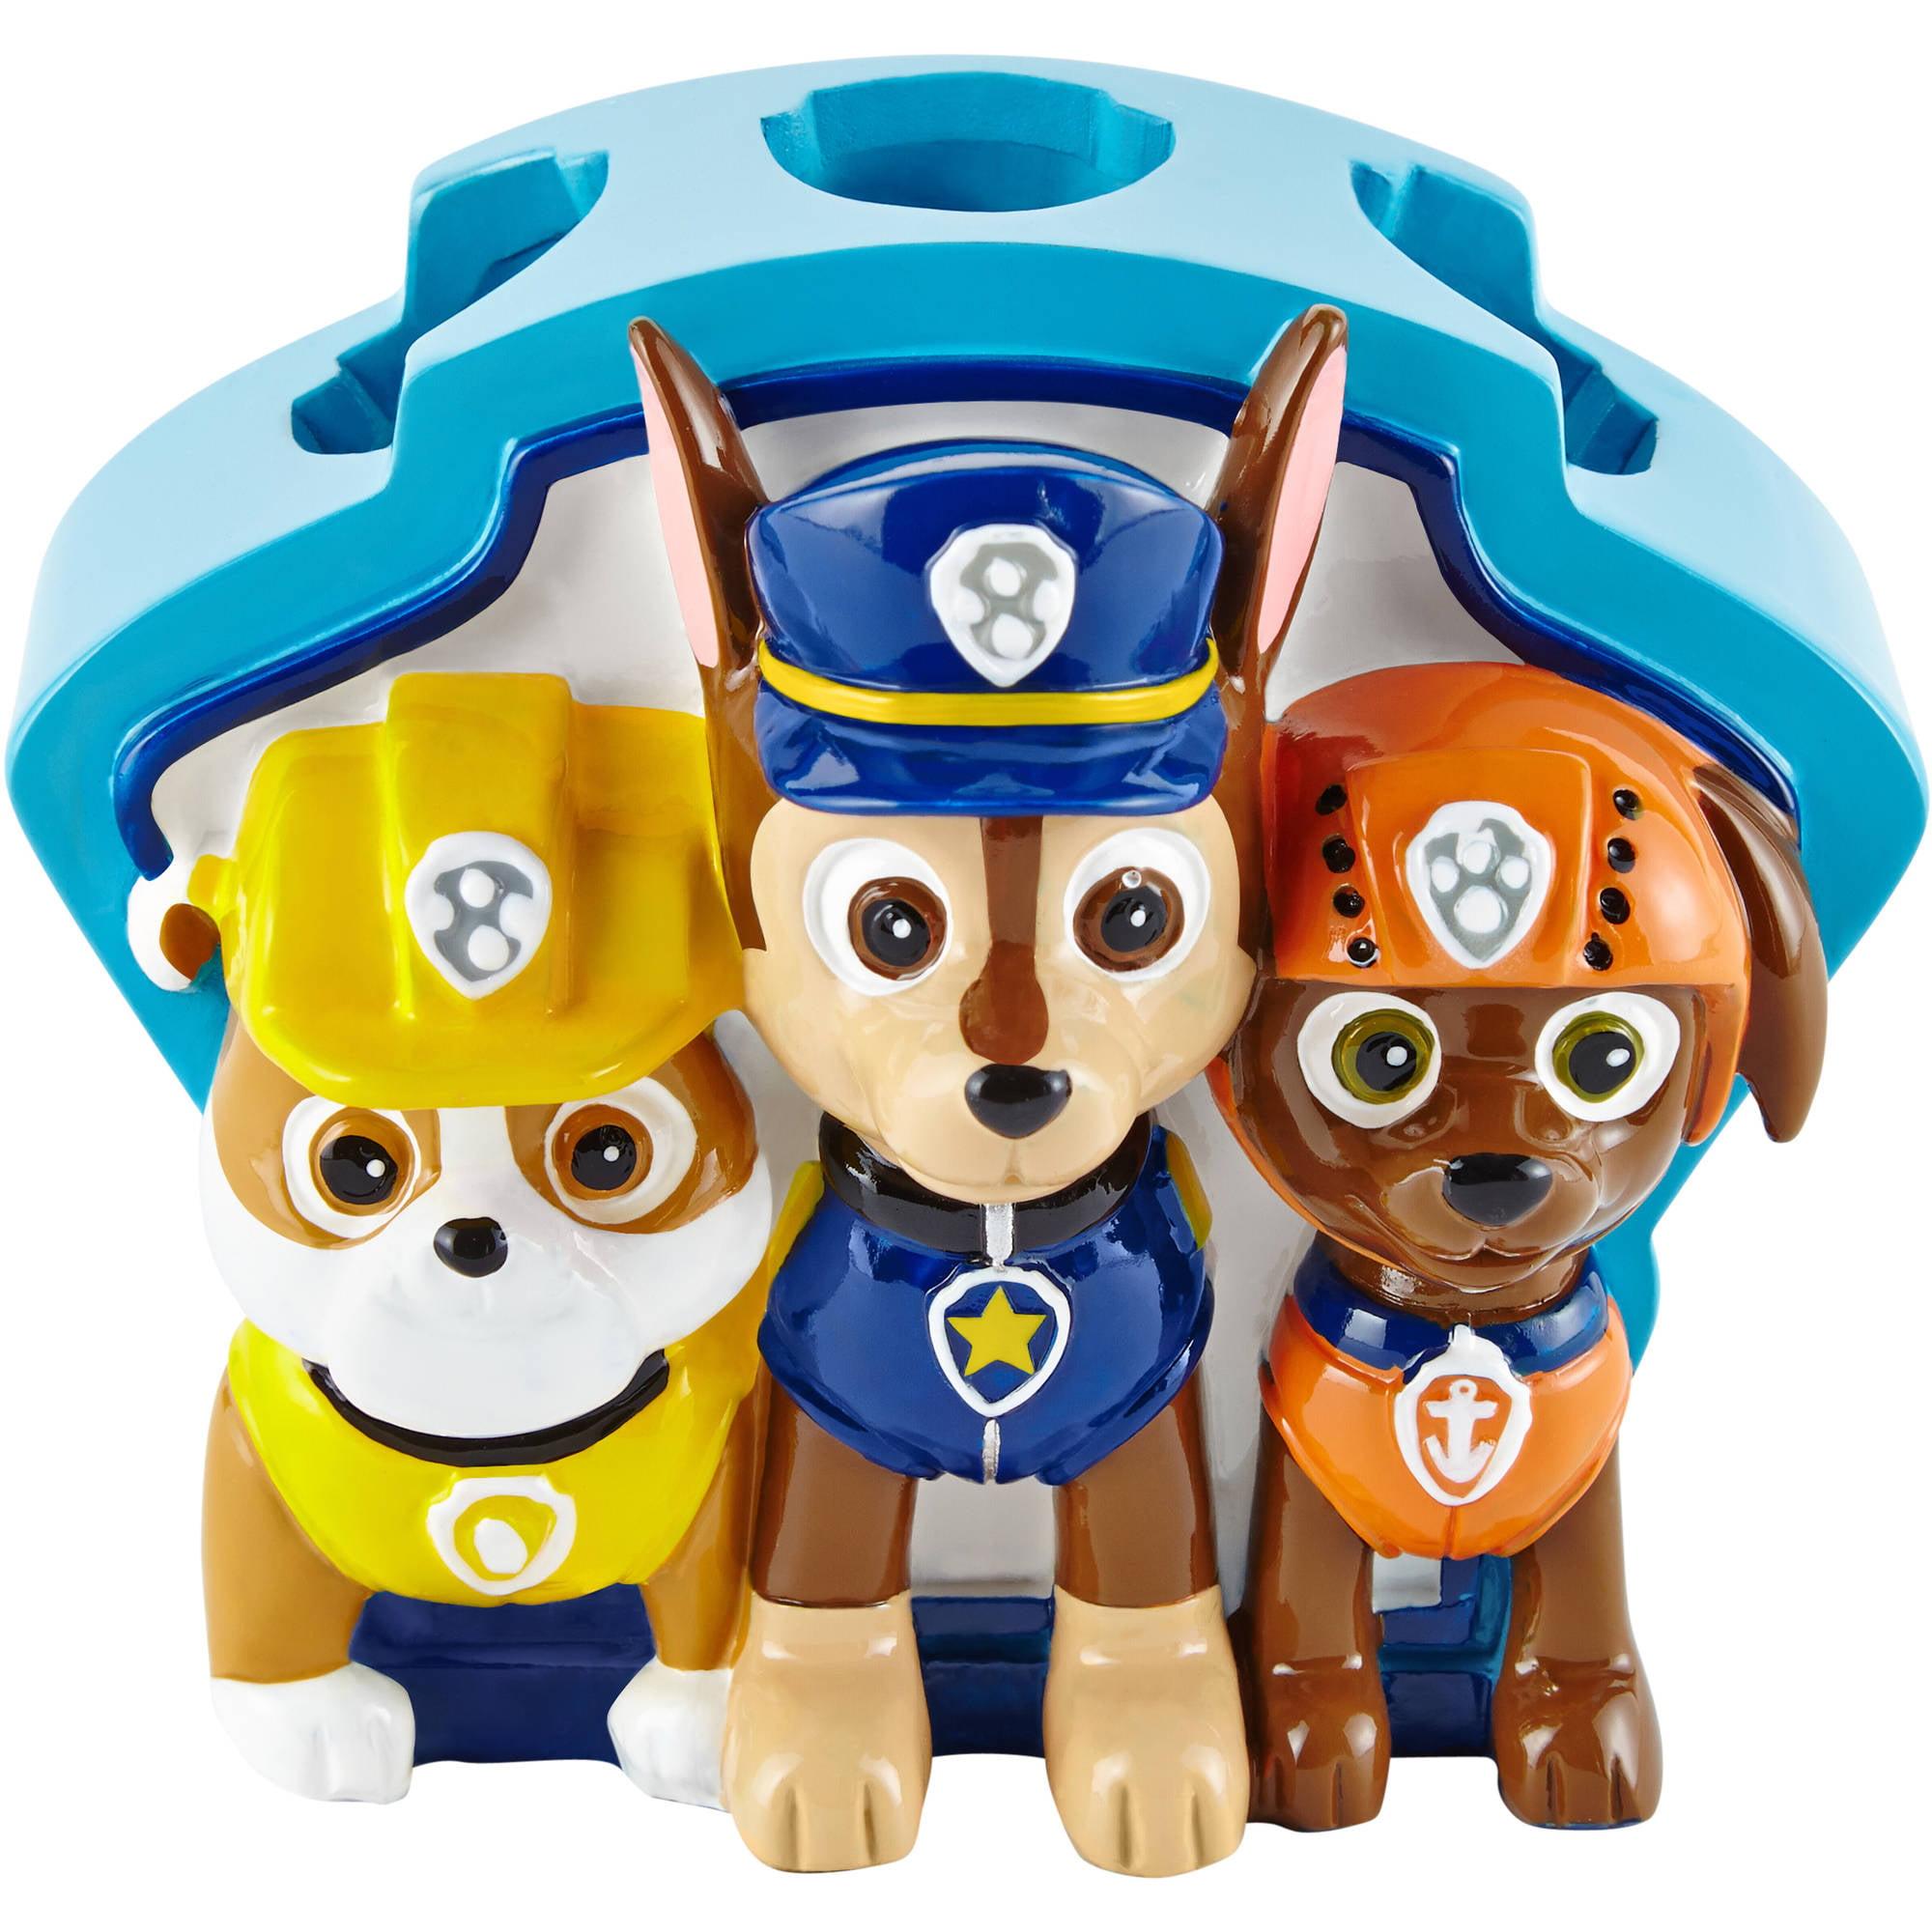 Nickelodeon Paw Patrol Toothbrush Holder, 1 Each